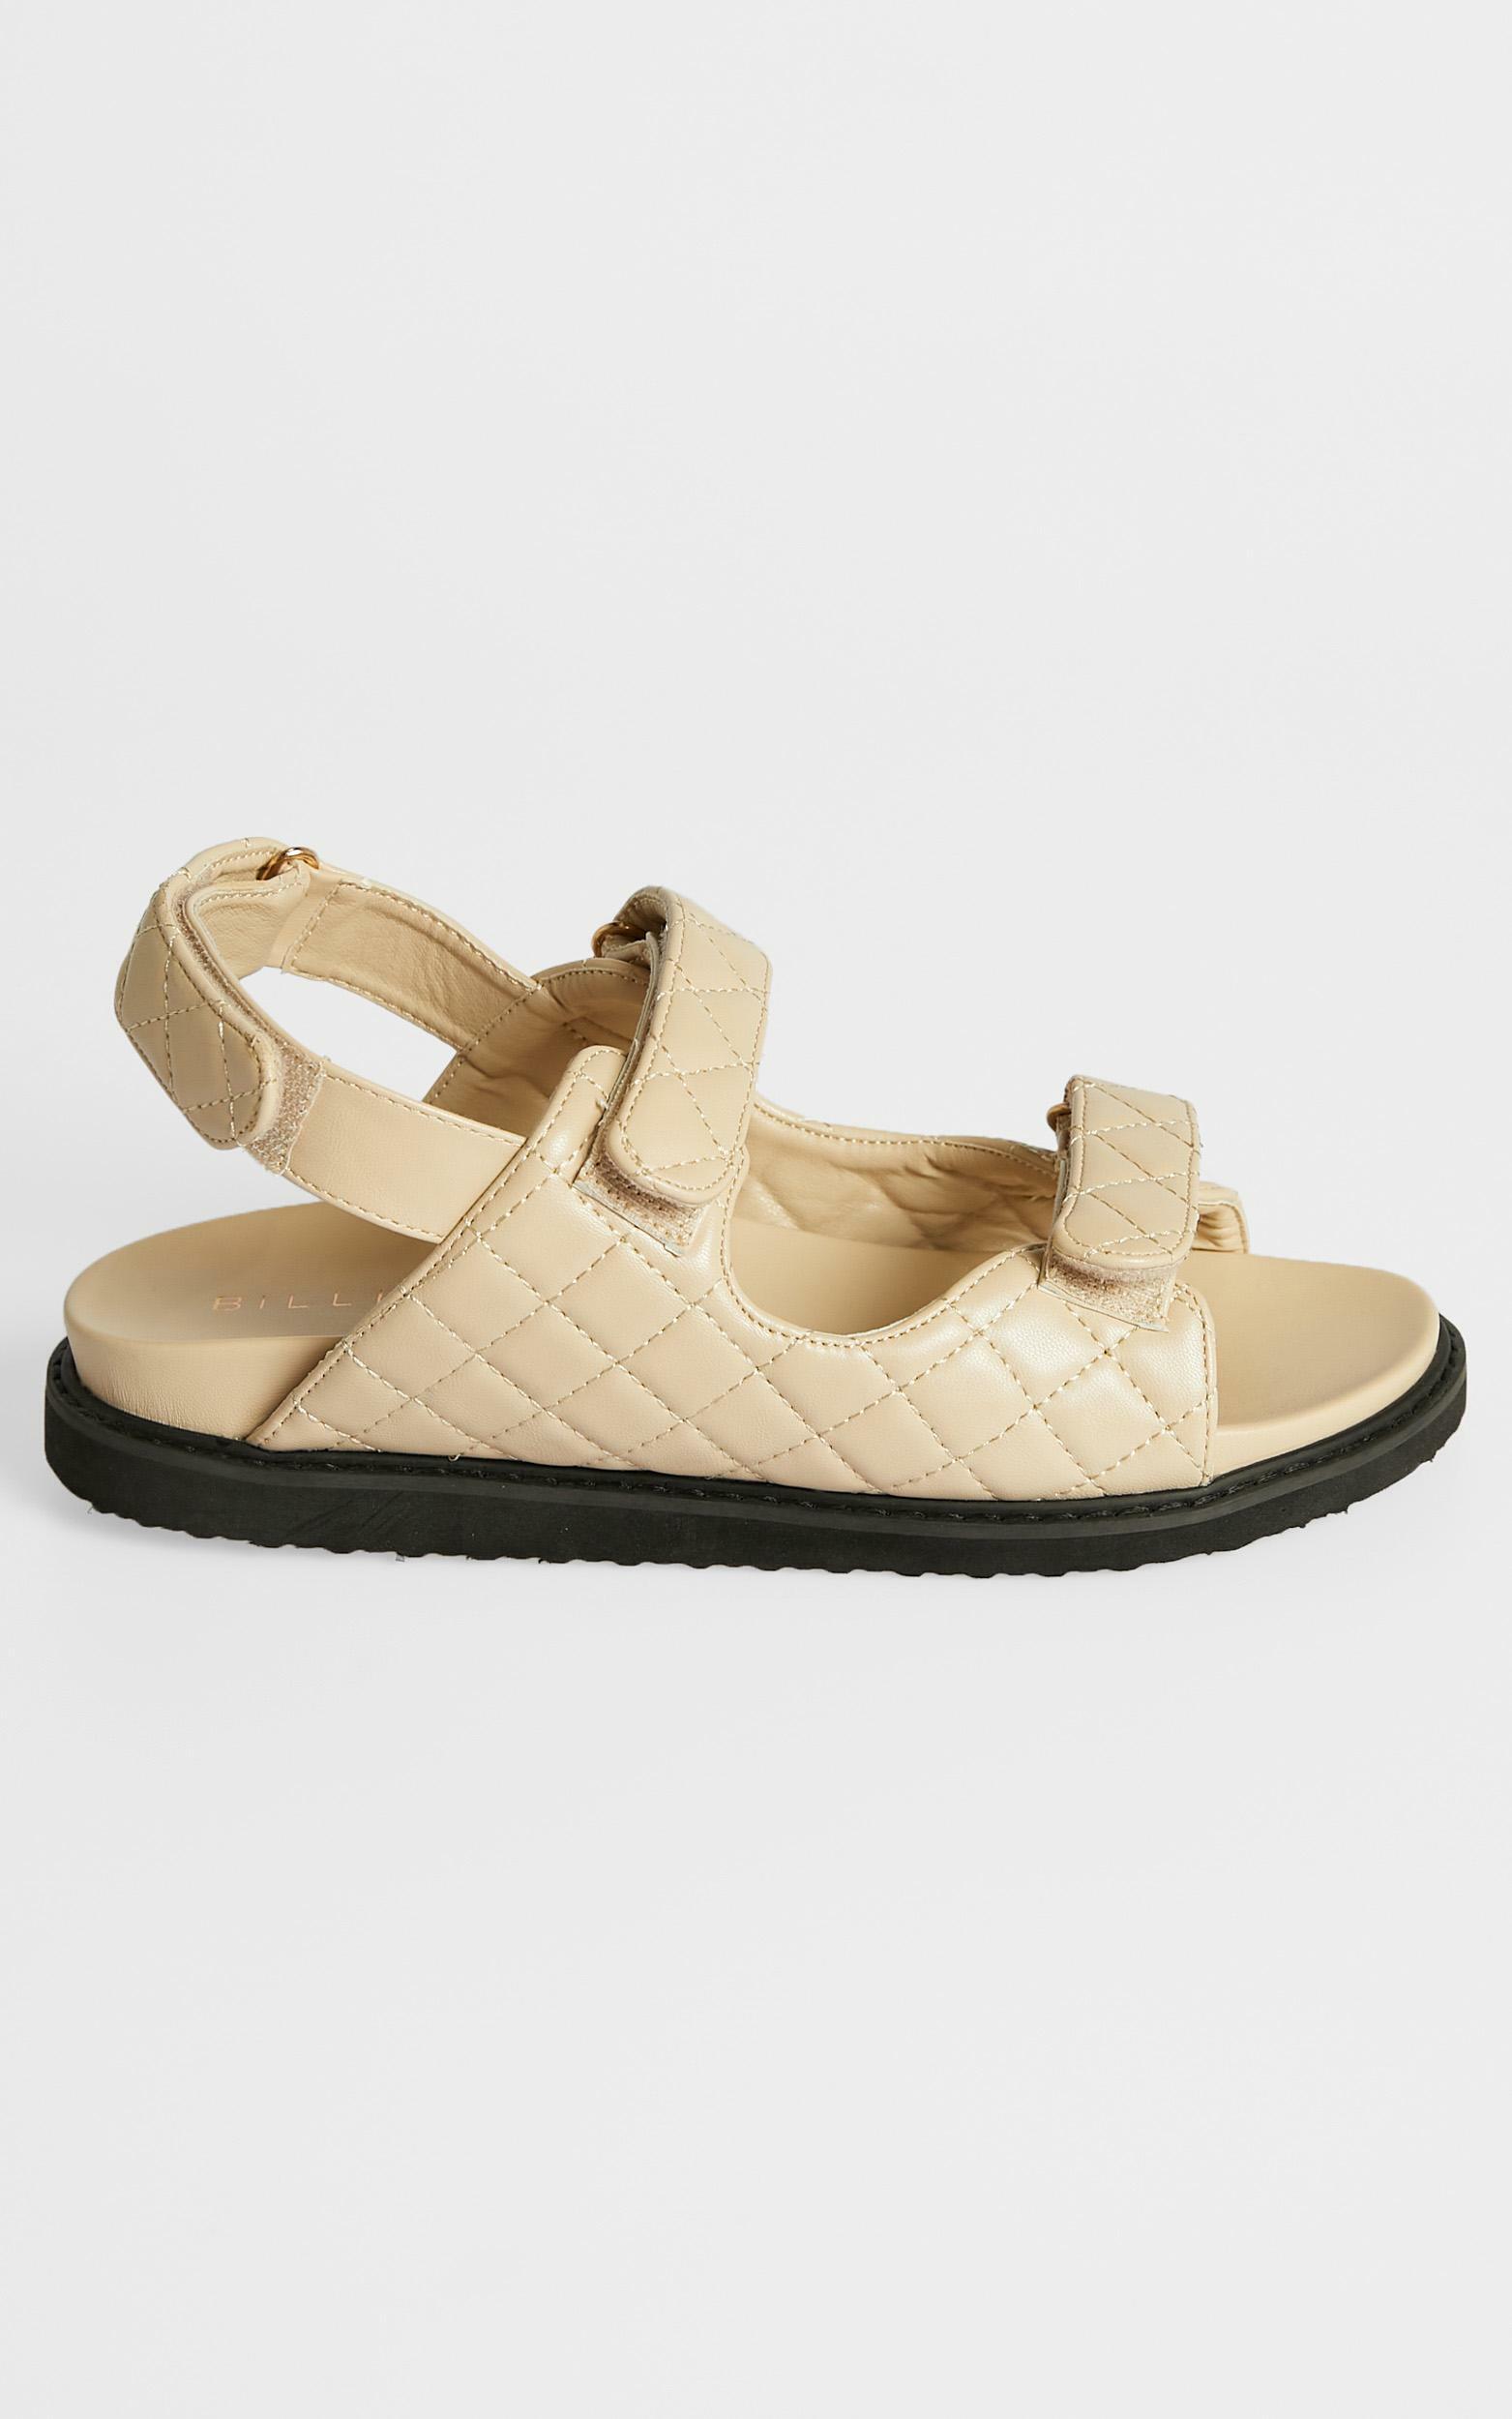 Billini - Zora Sandals in Light Taupe - 05, BRN2, hi-res image number null